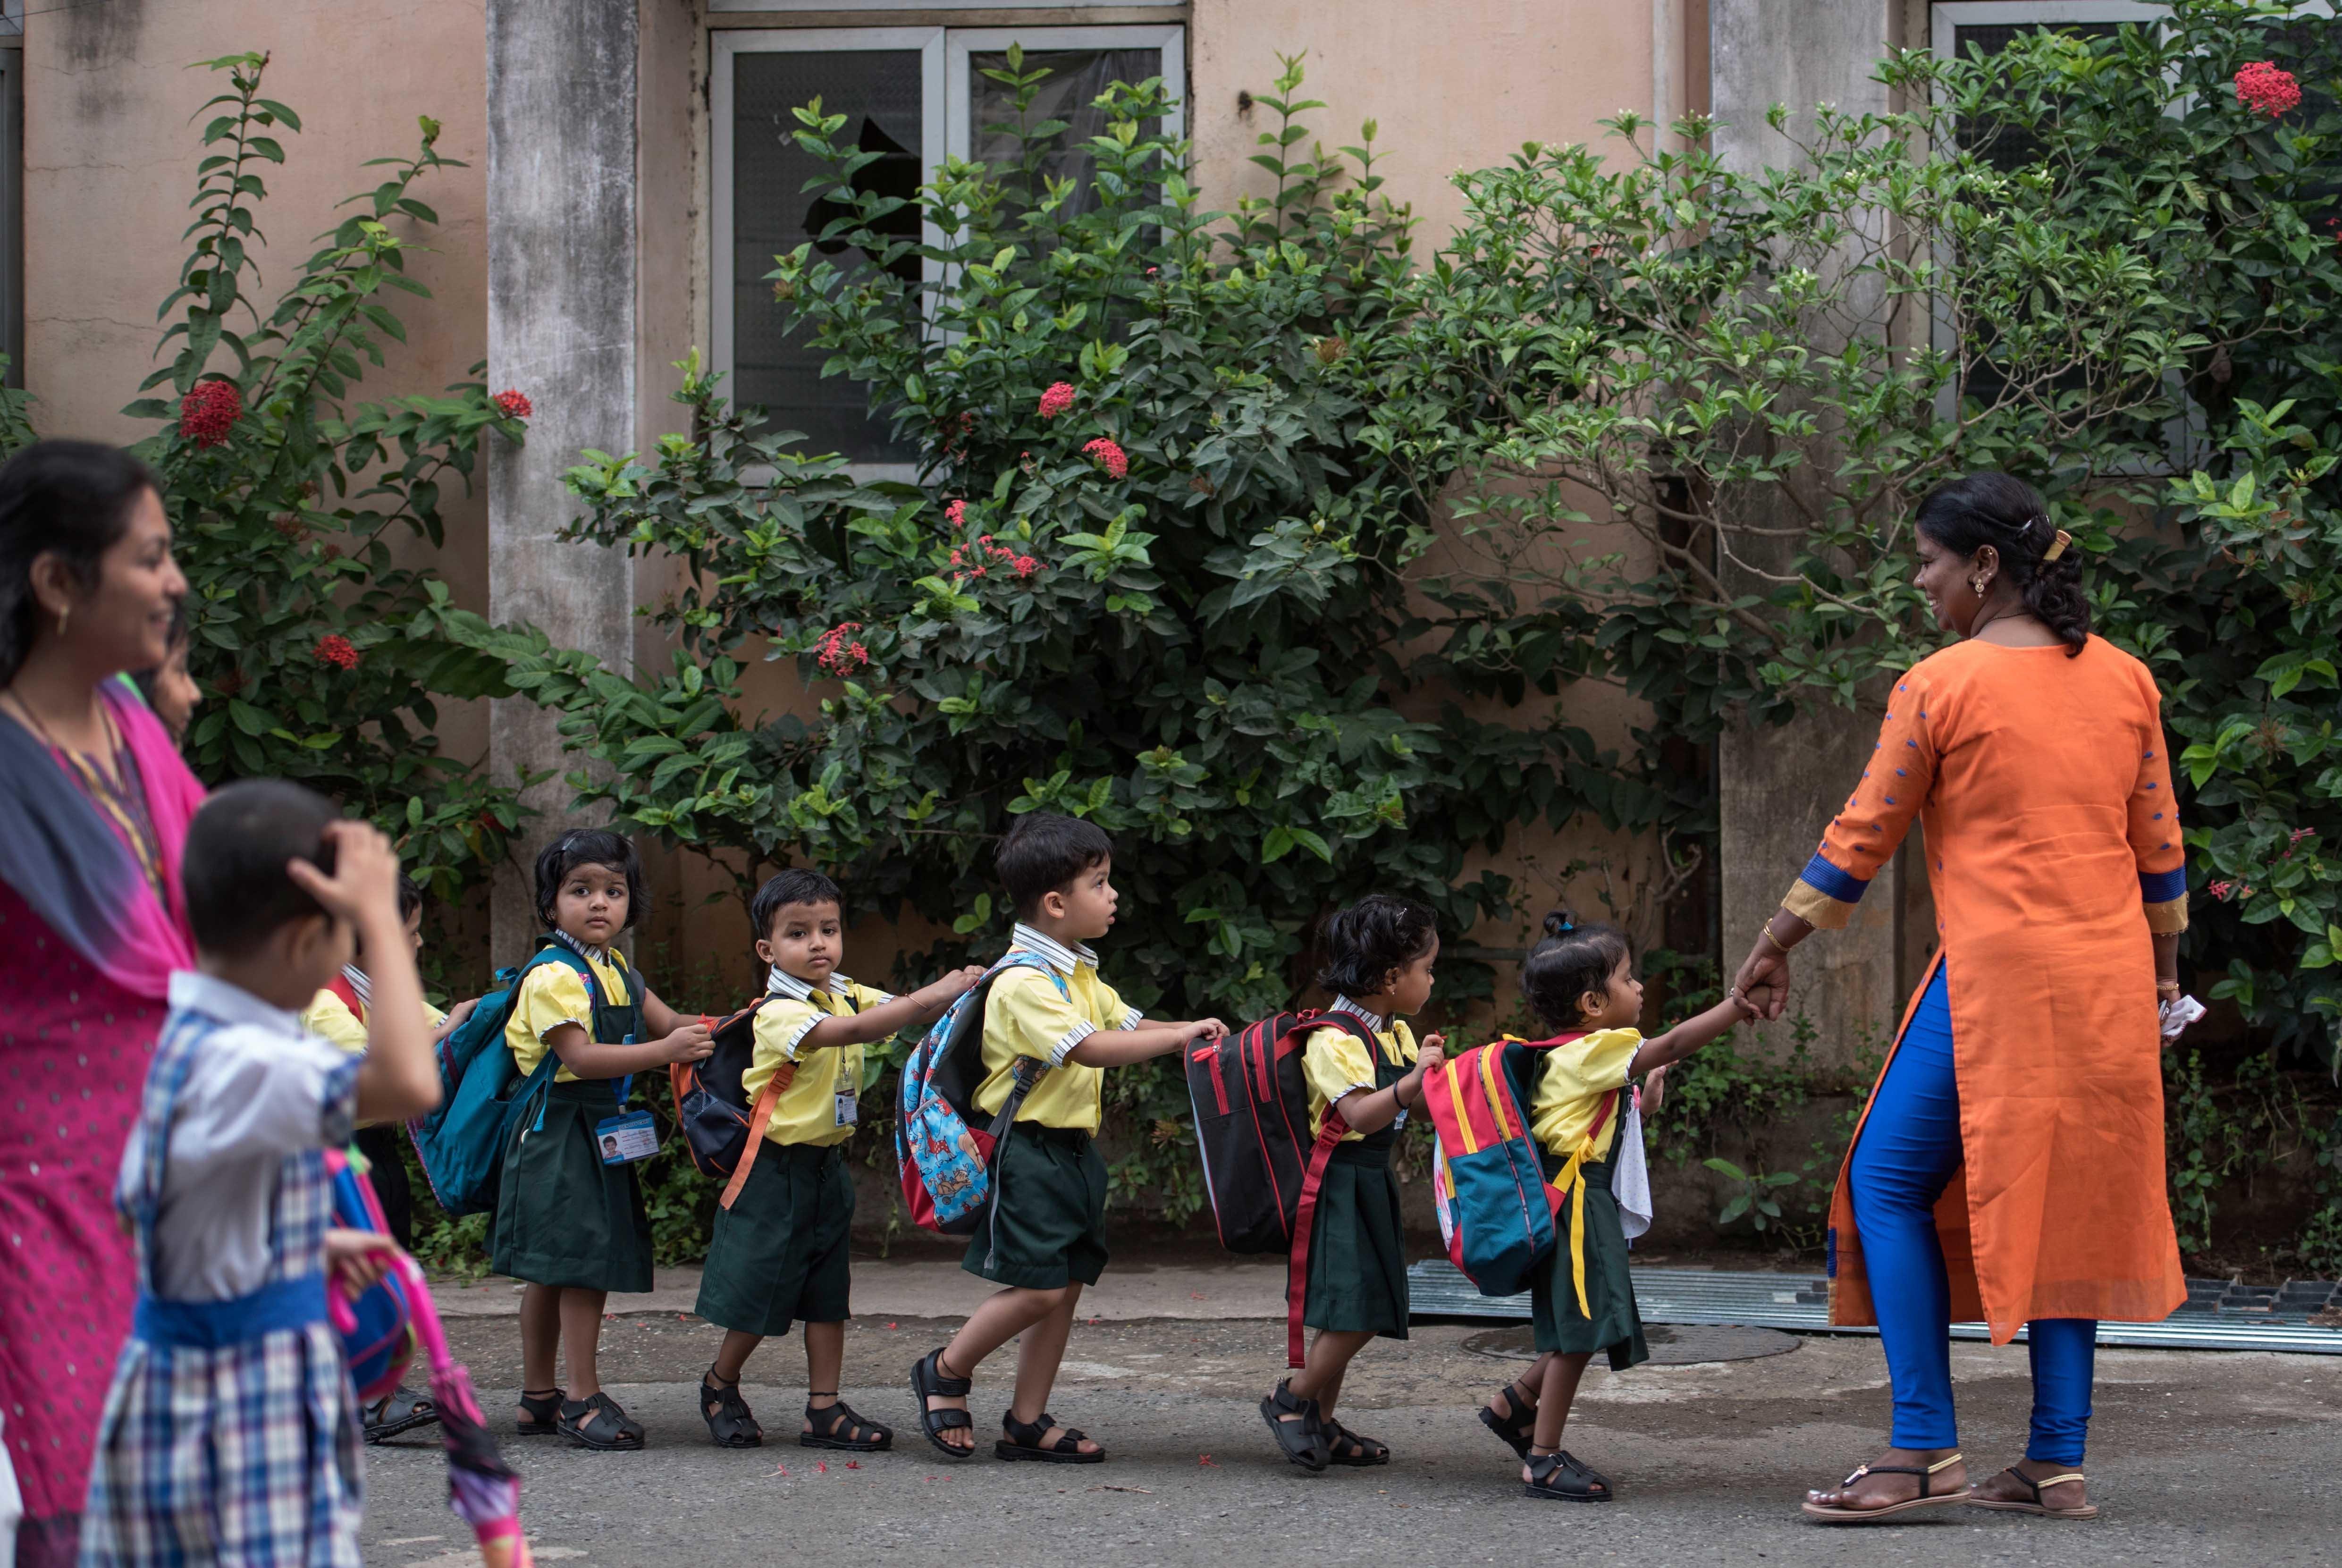 Children enjoy the first day of school at Mahila Sangh School, Vile Parle in Mumbai, India.